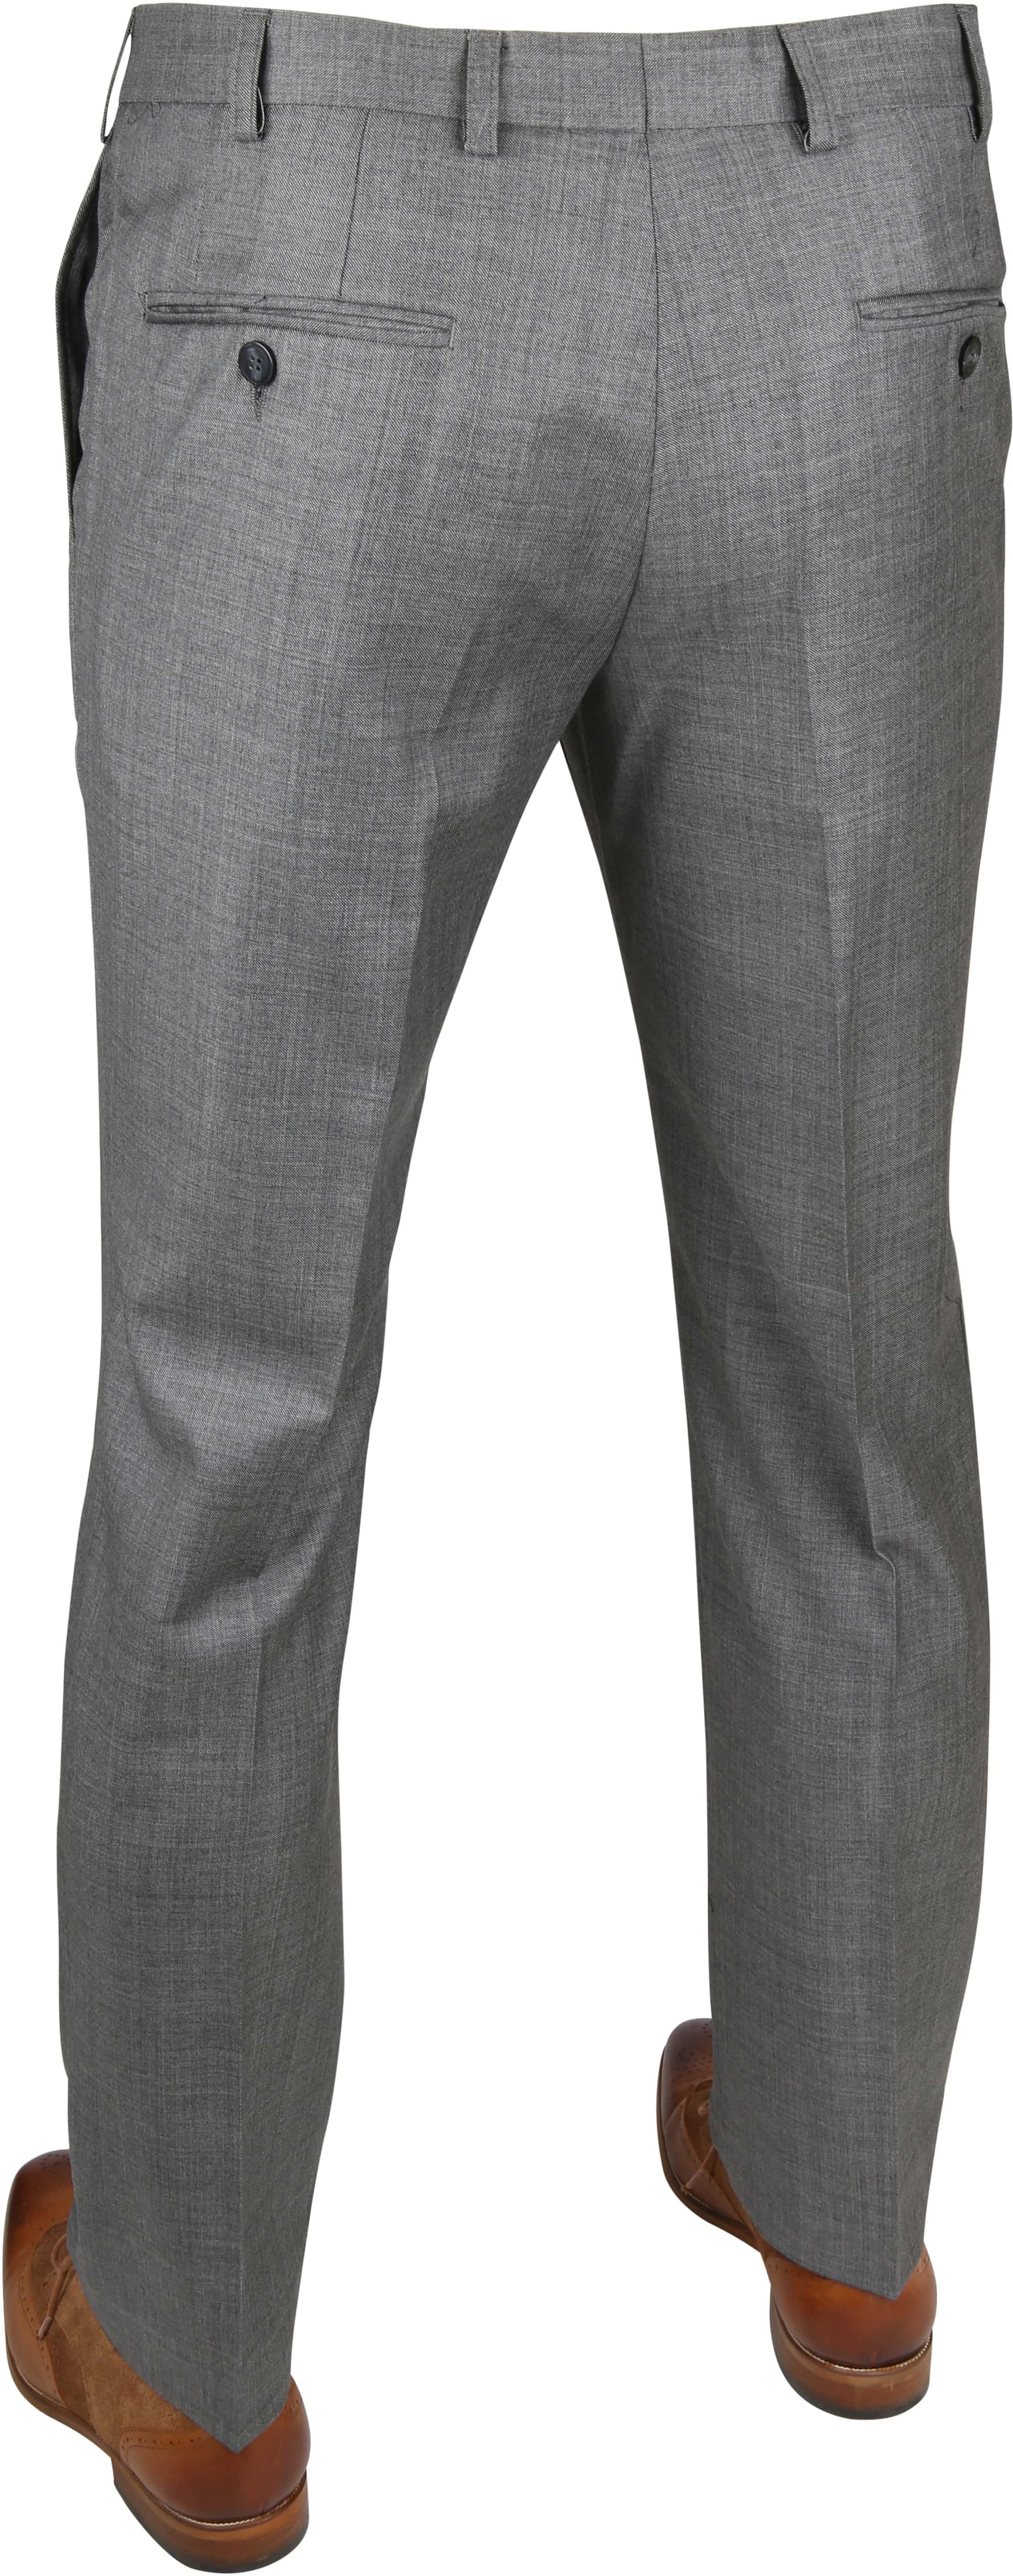 Suitable Pantalon Evans Dark Grey photo 3